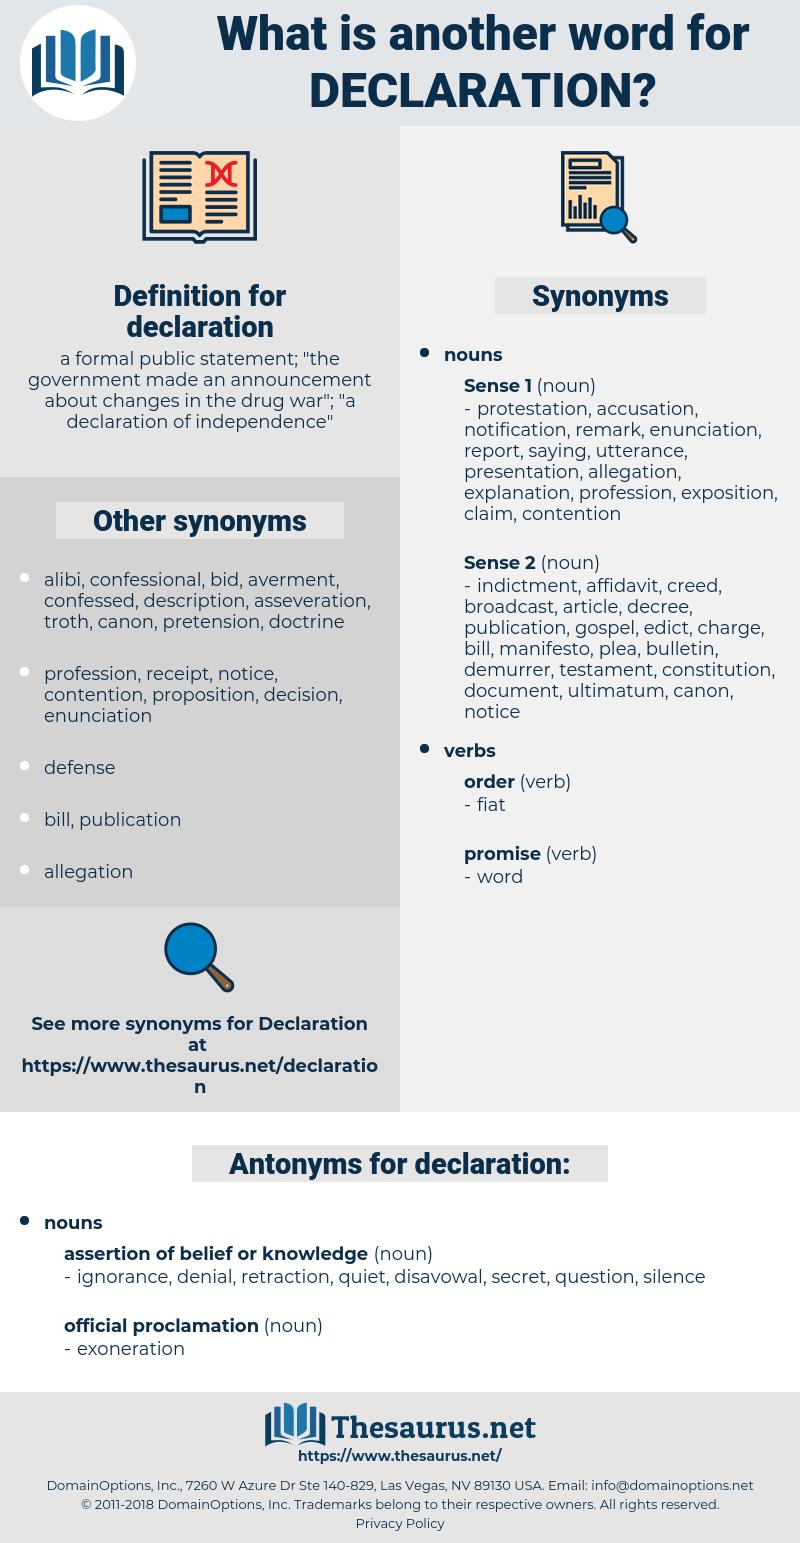 declaration, synonym declaration, another word for declaration, words like declaration, thesaurus declaration